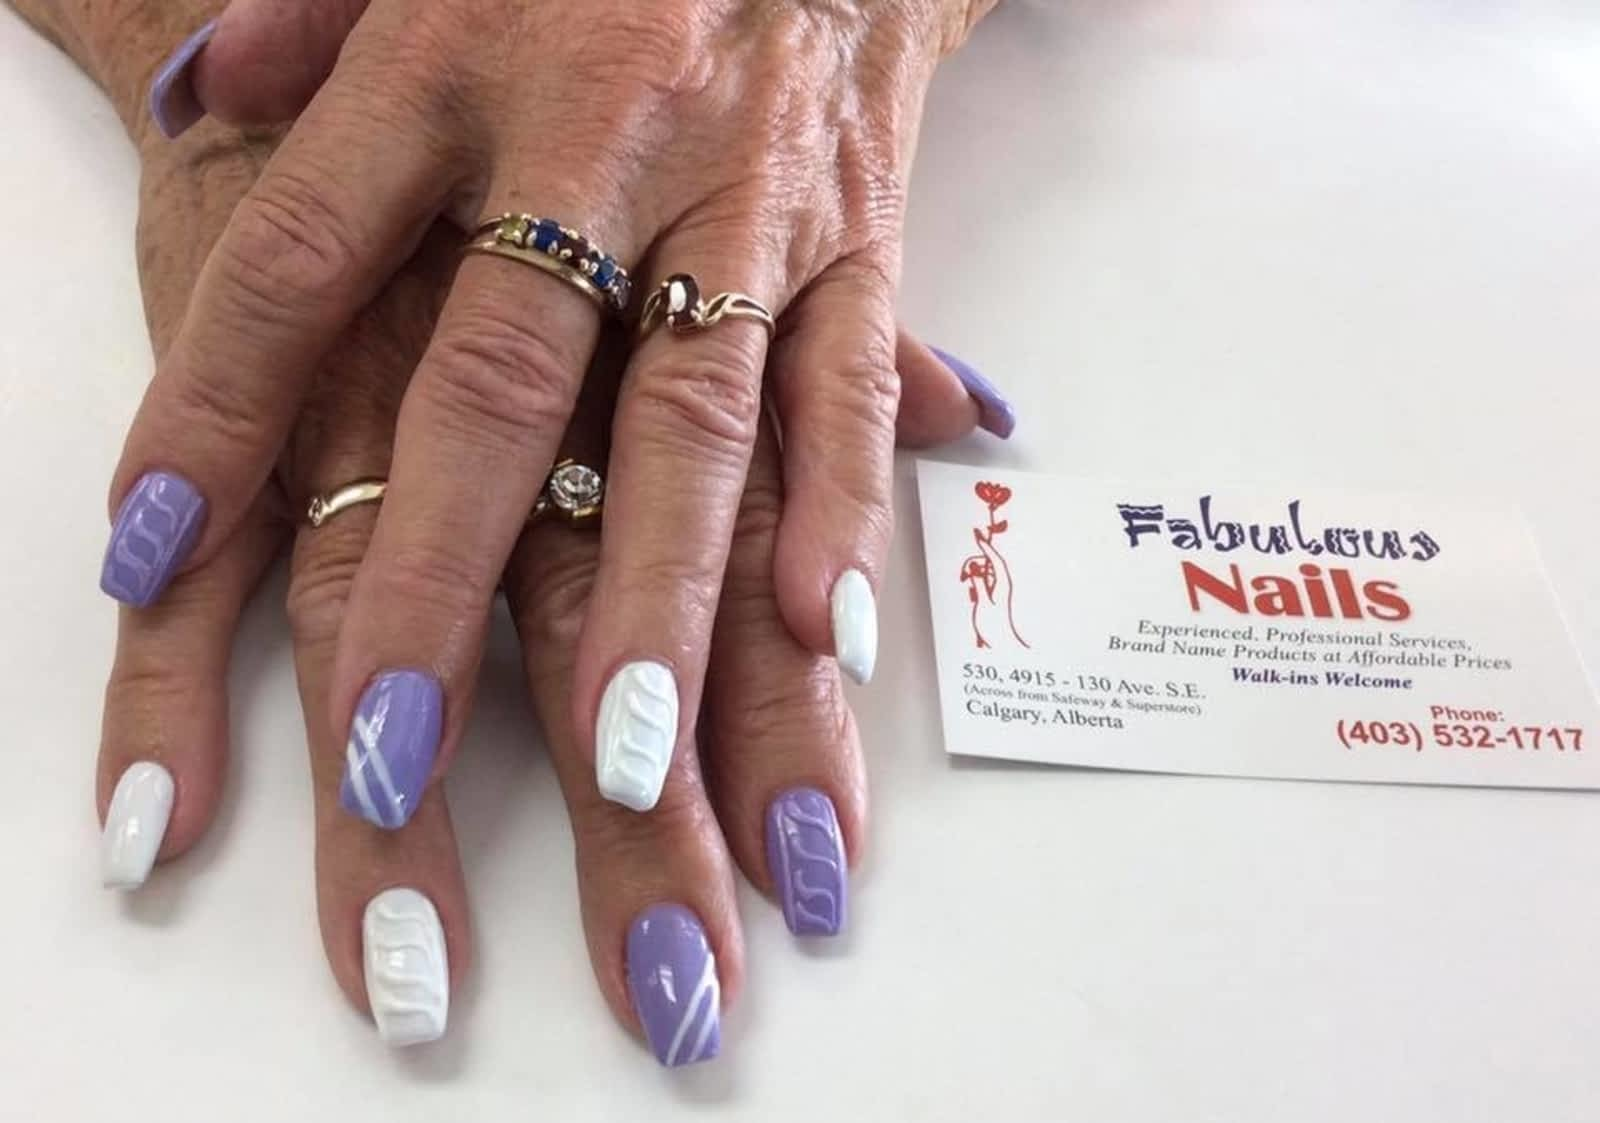 Fabulous Nails - Opening Hours - 4915 130 Avenue Southeast, Calgary, AB